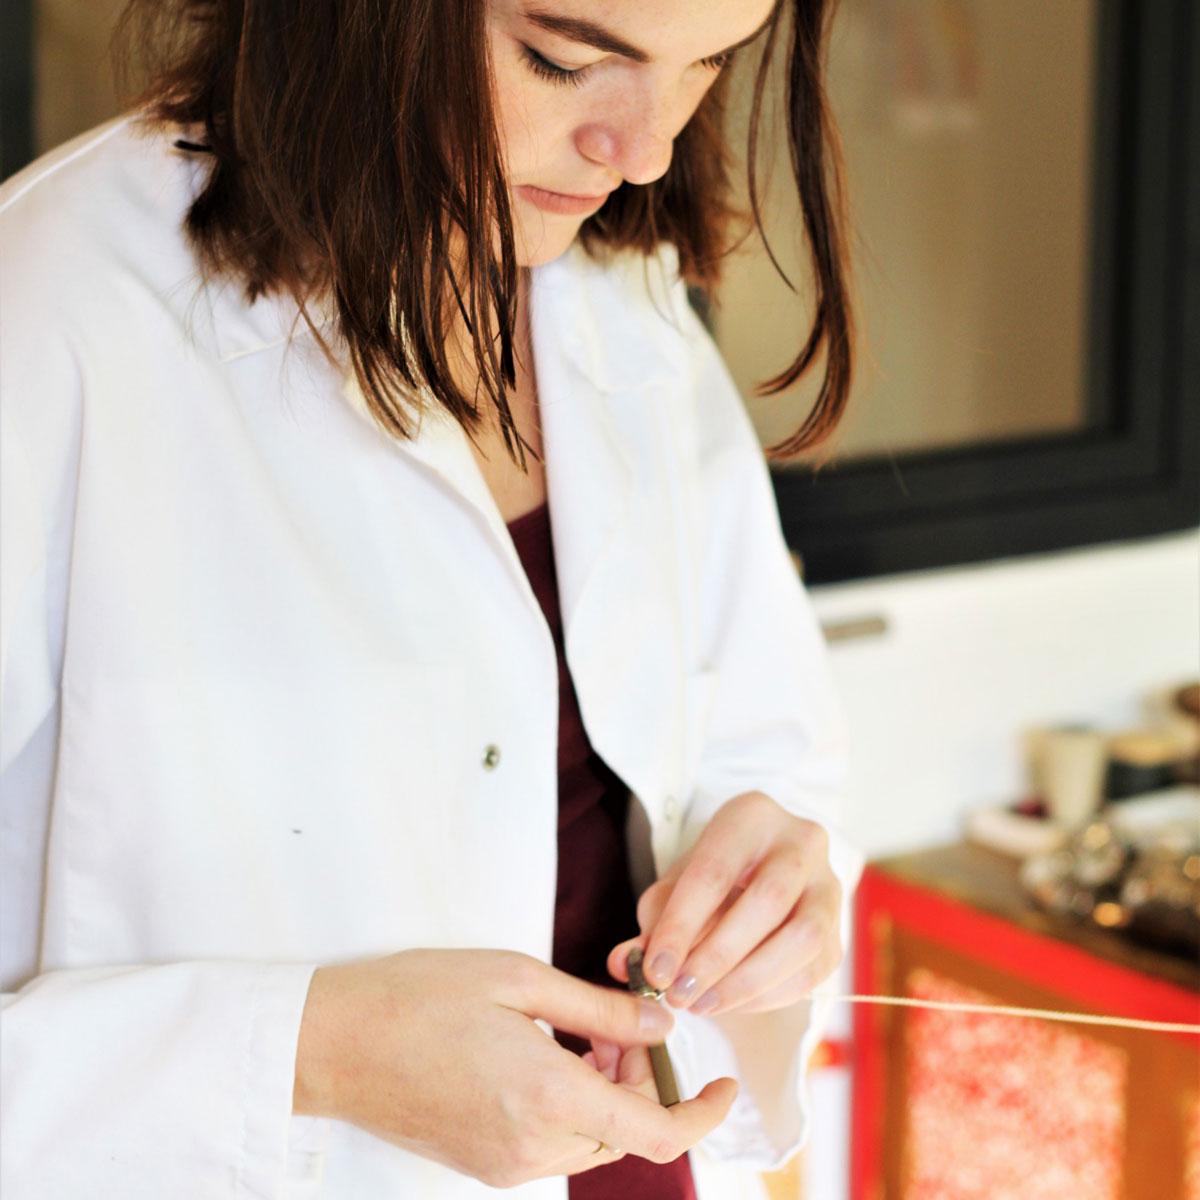 Torsader métal bijou cours atelier Robin Paris